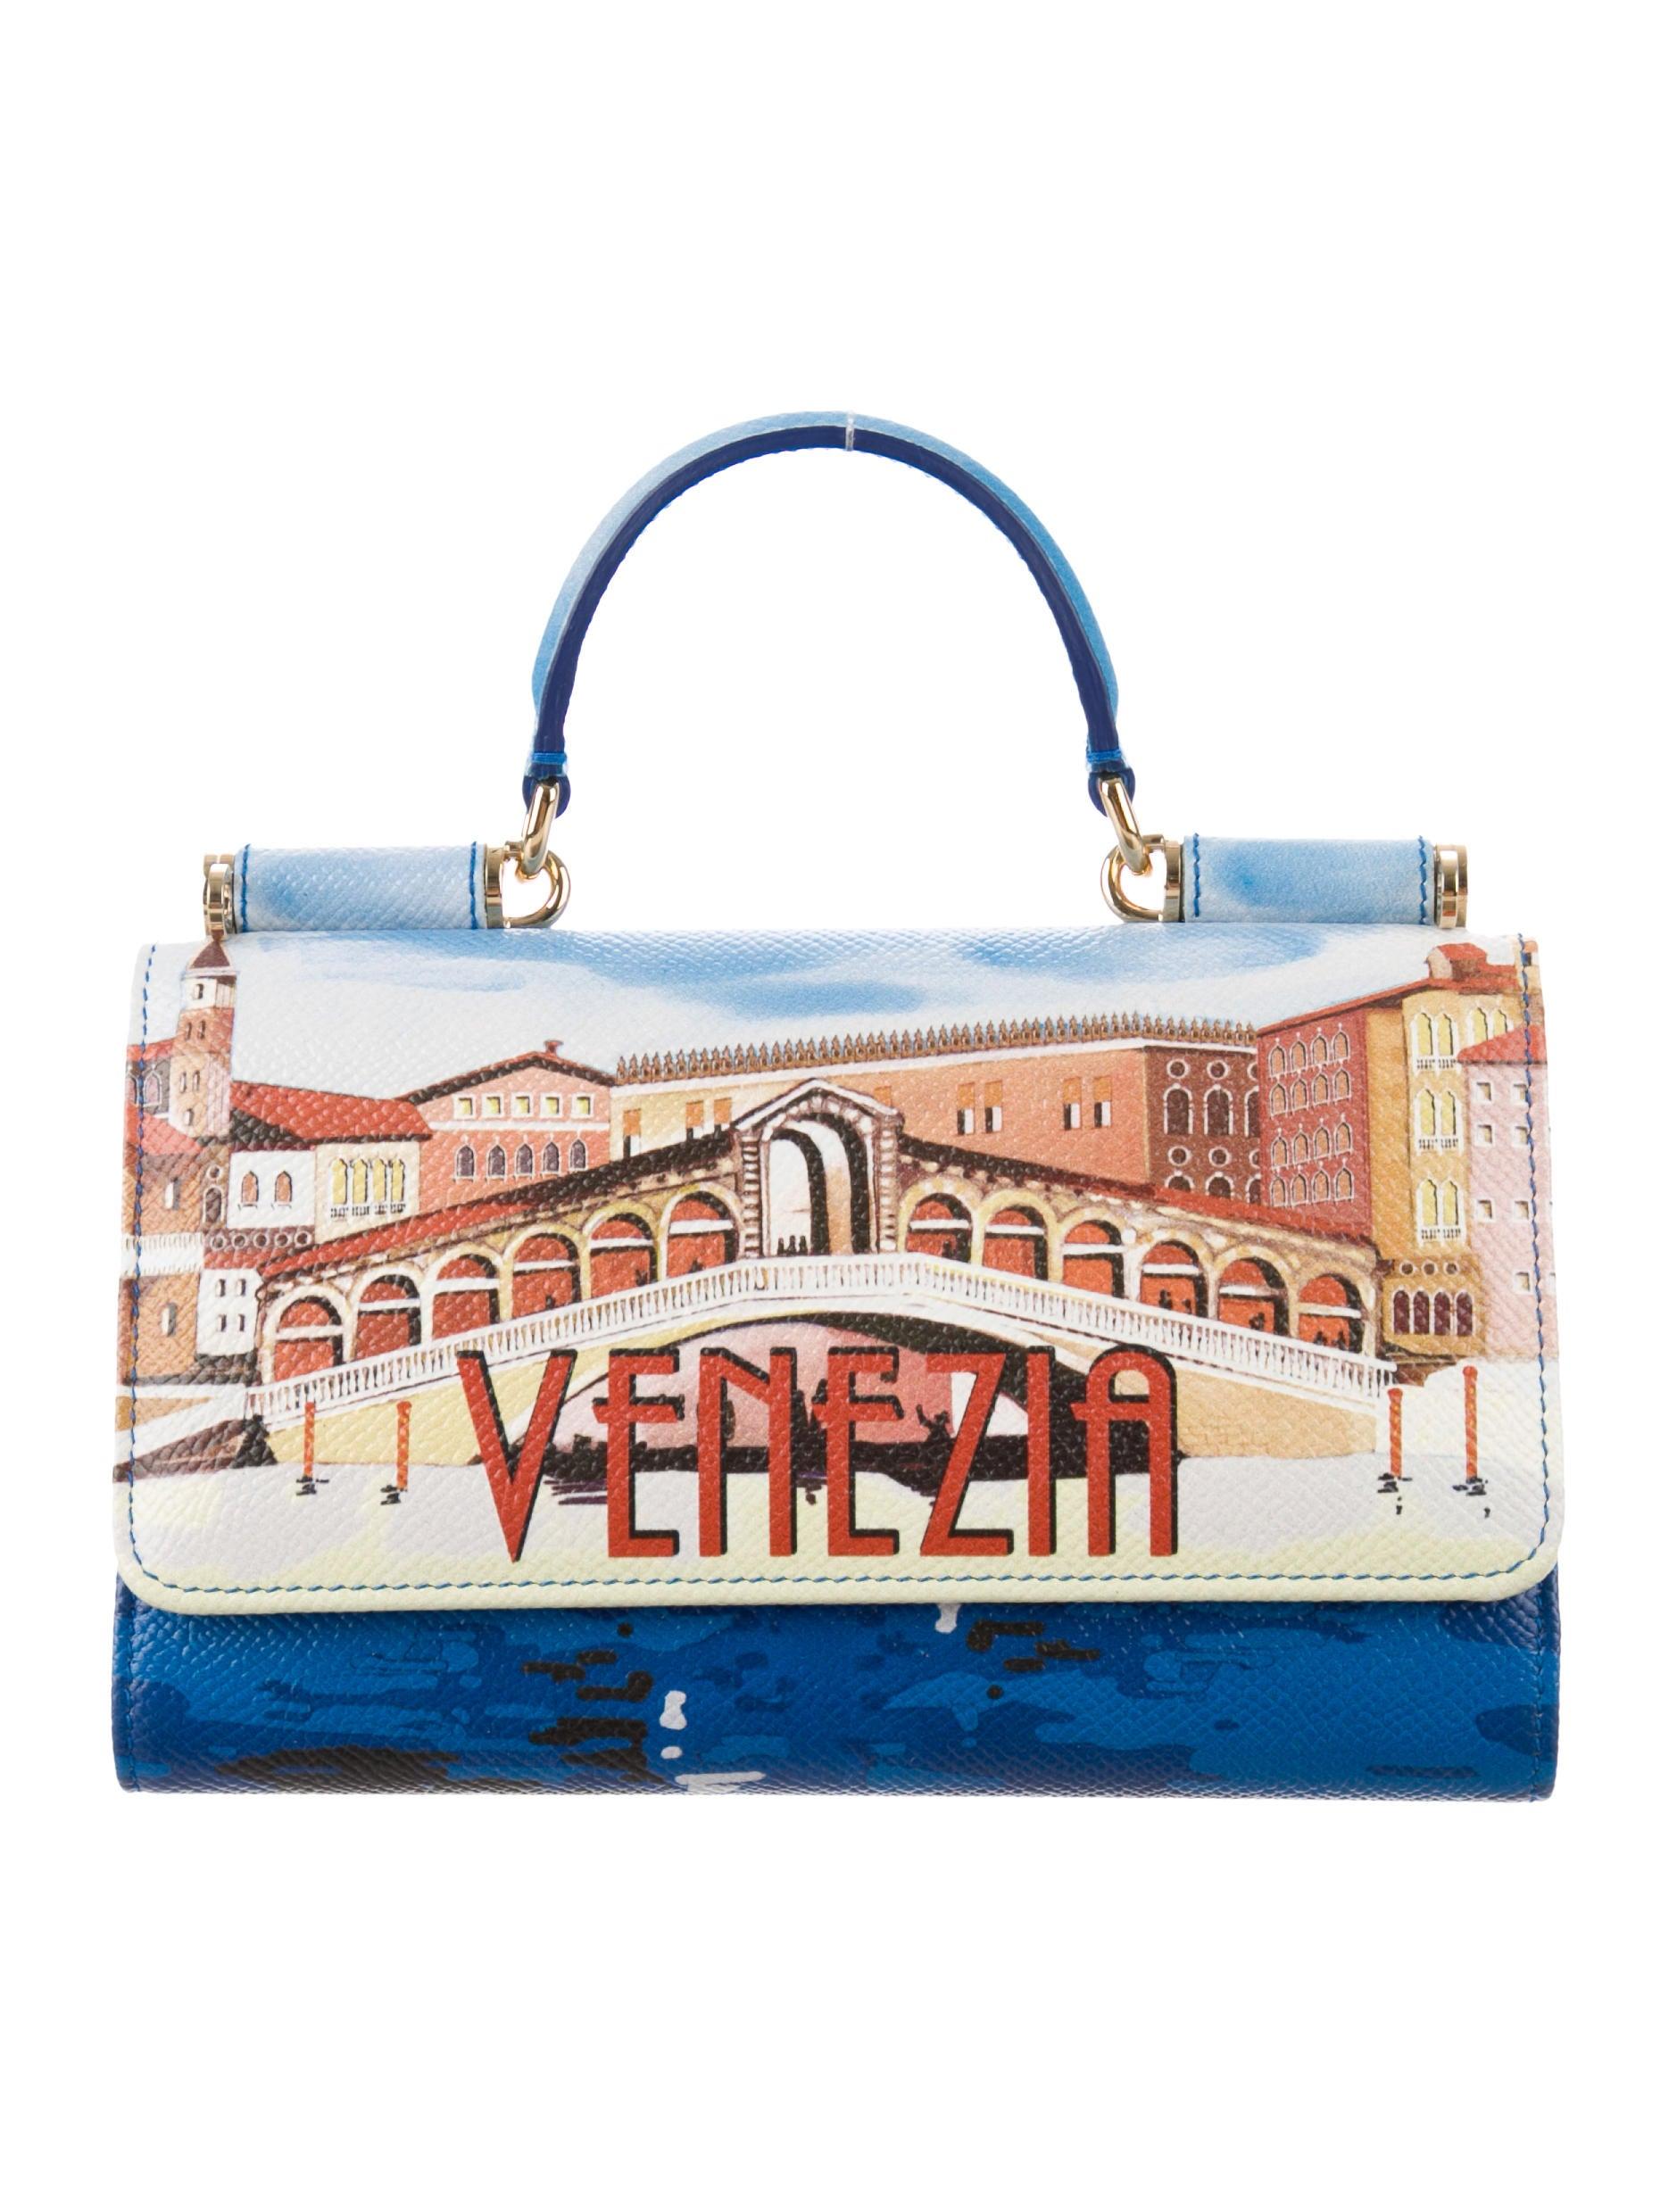 Dolce   Gabbana Mini Sicily Von Phone Crossbody Bag - Handbags ... 2559634d06645